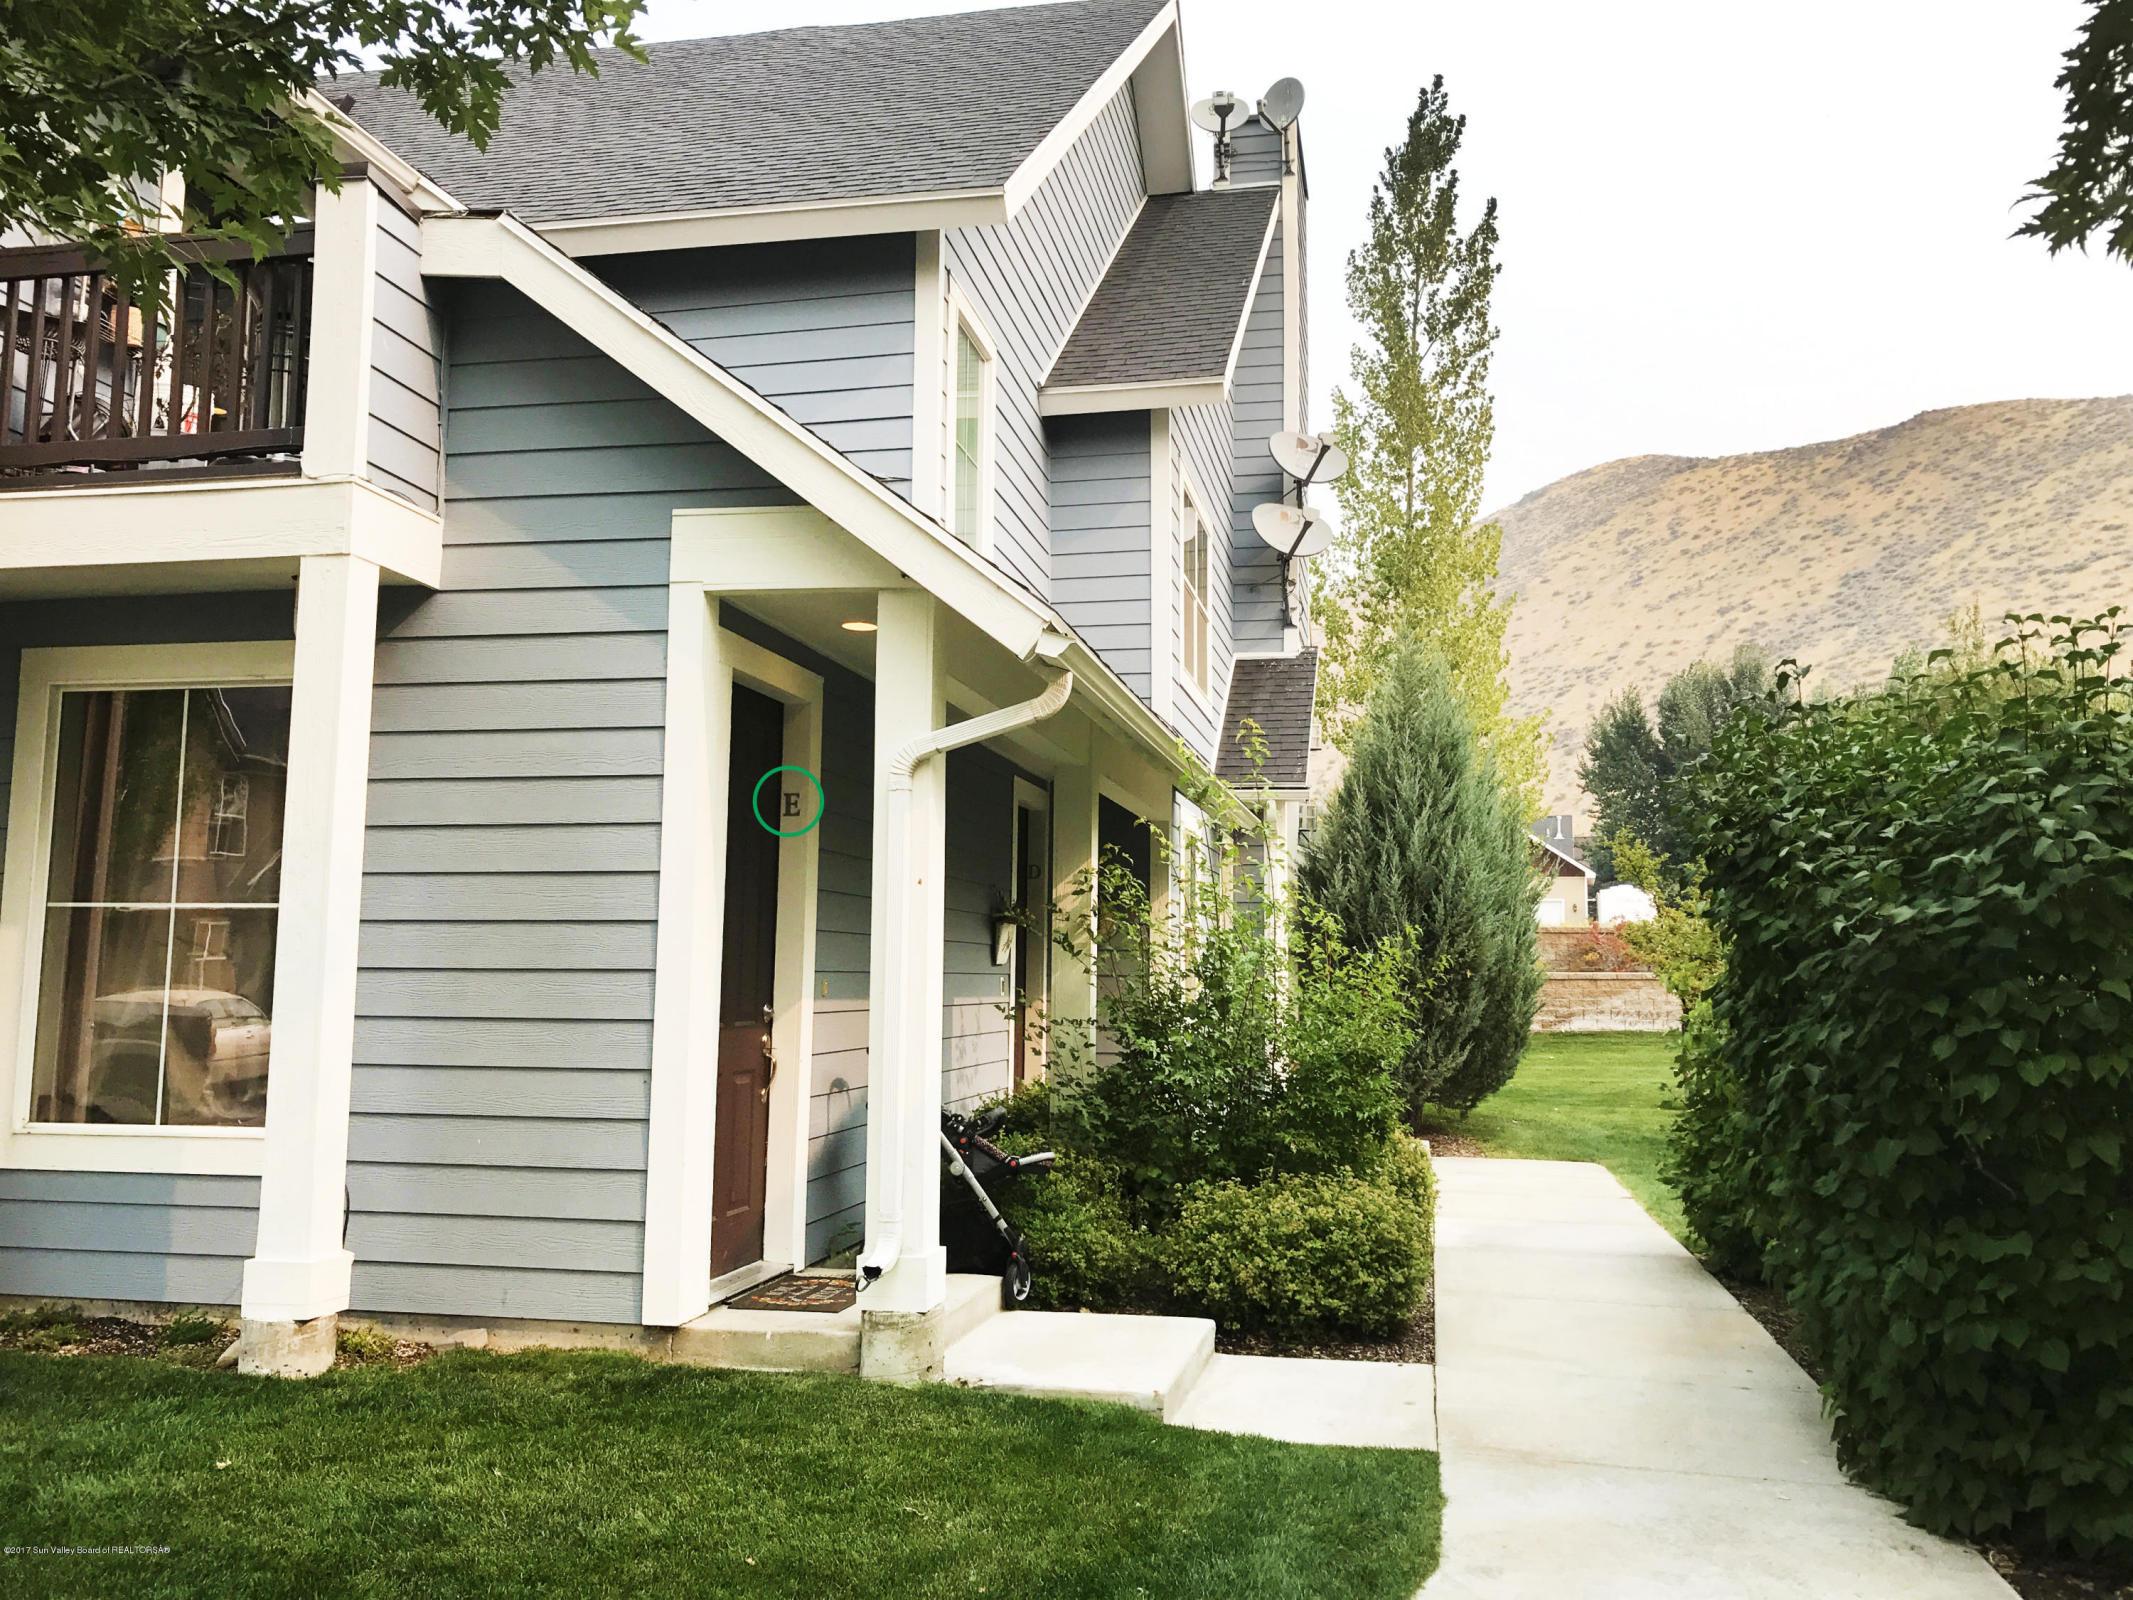 Affordable Condo in Hailey, Idaho